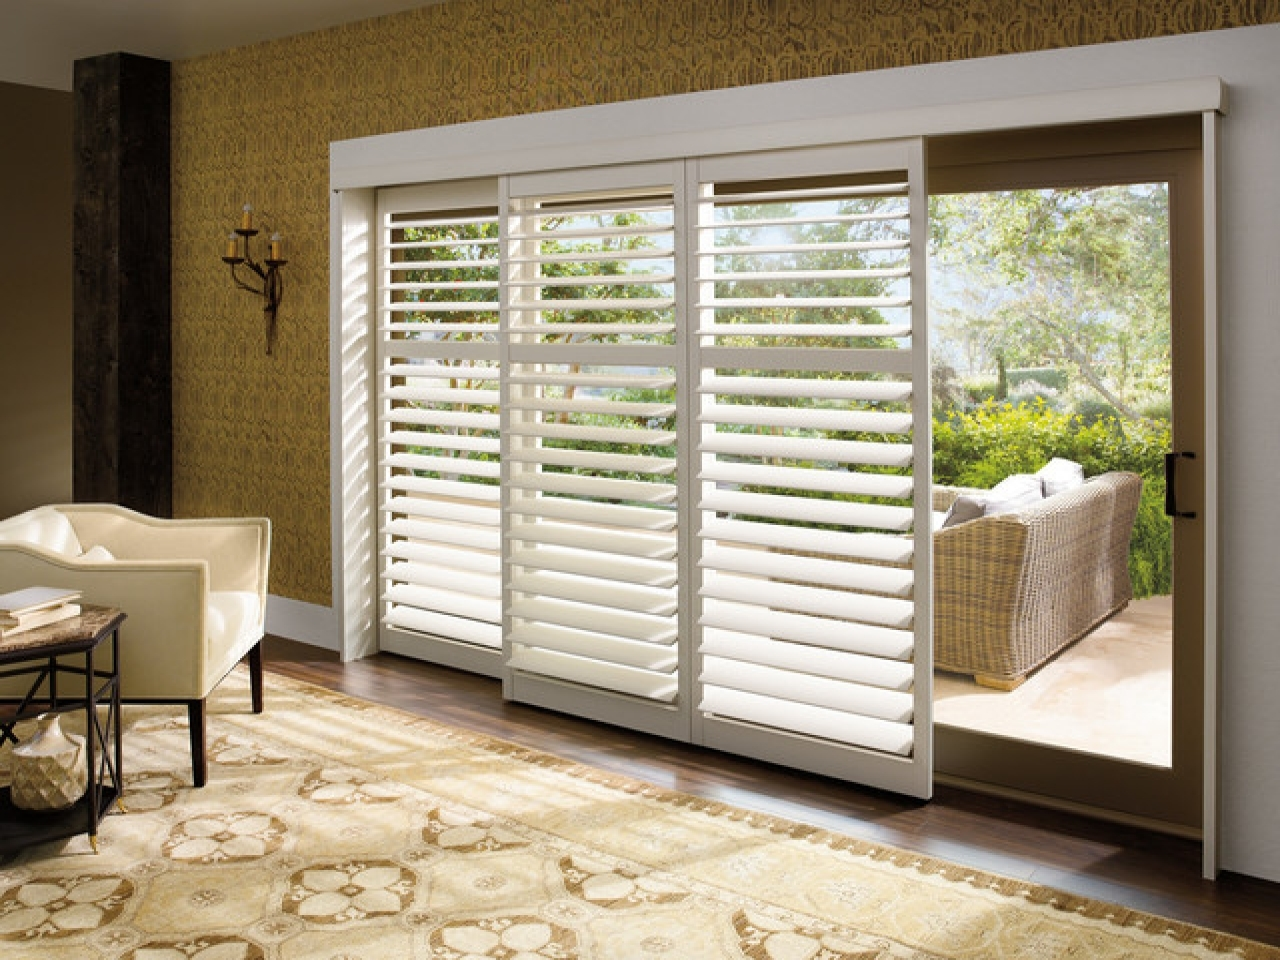 Window Blinds For Sliding Patio DoorsWindow Blinds For Sliding Patio Doors